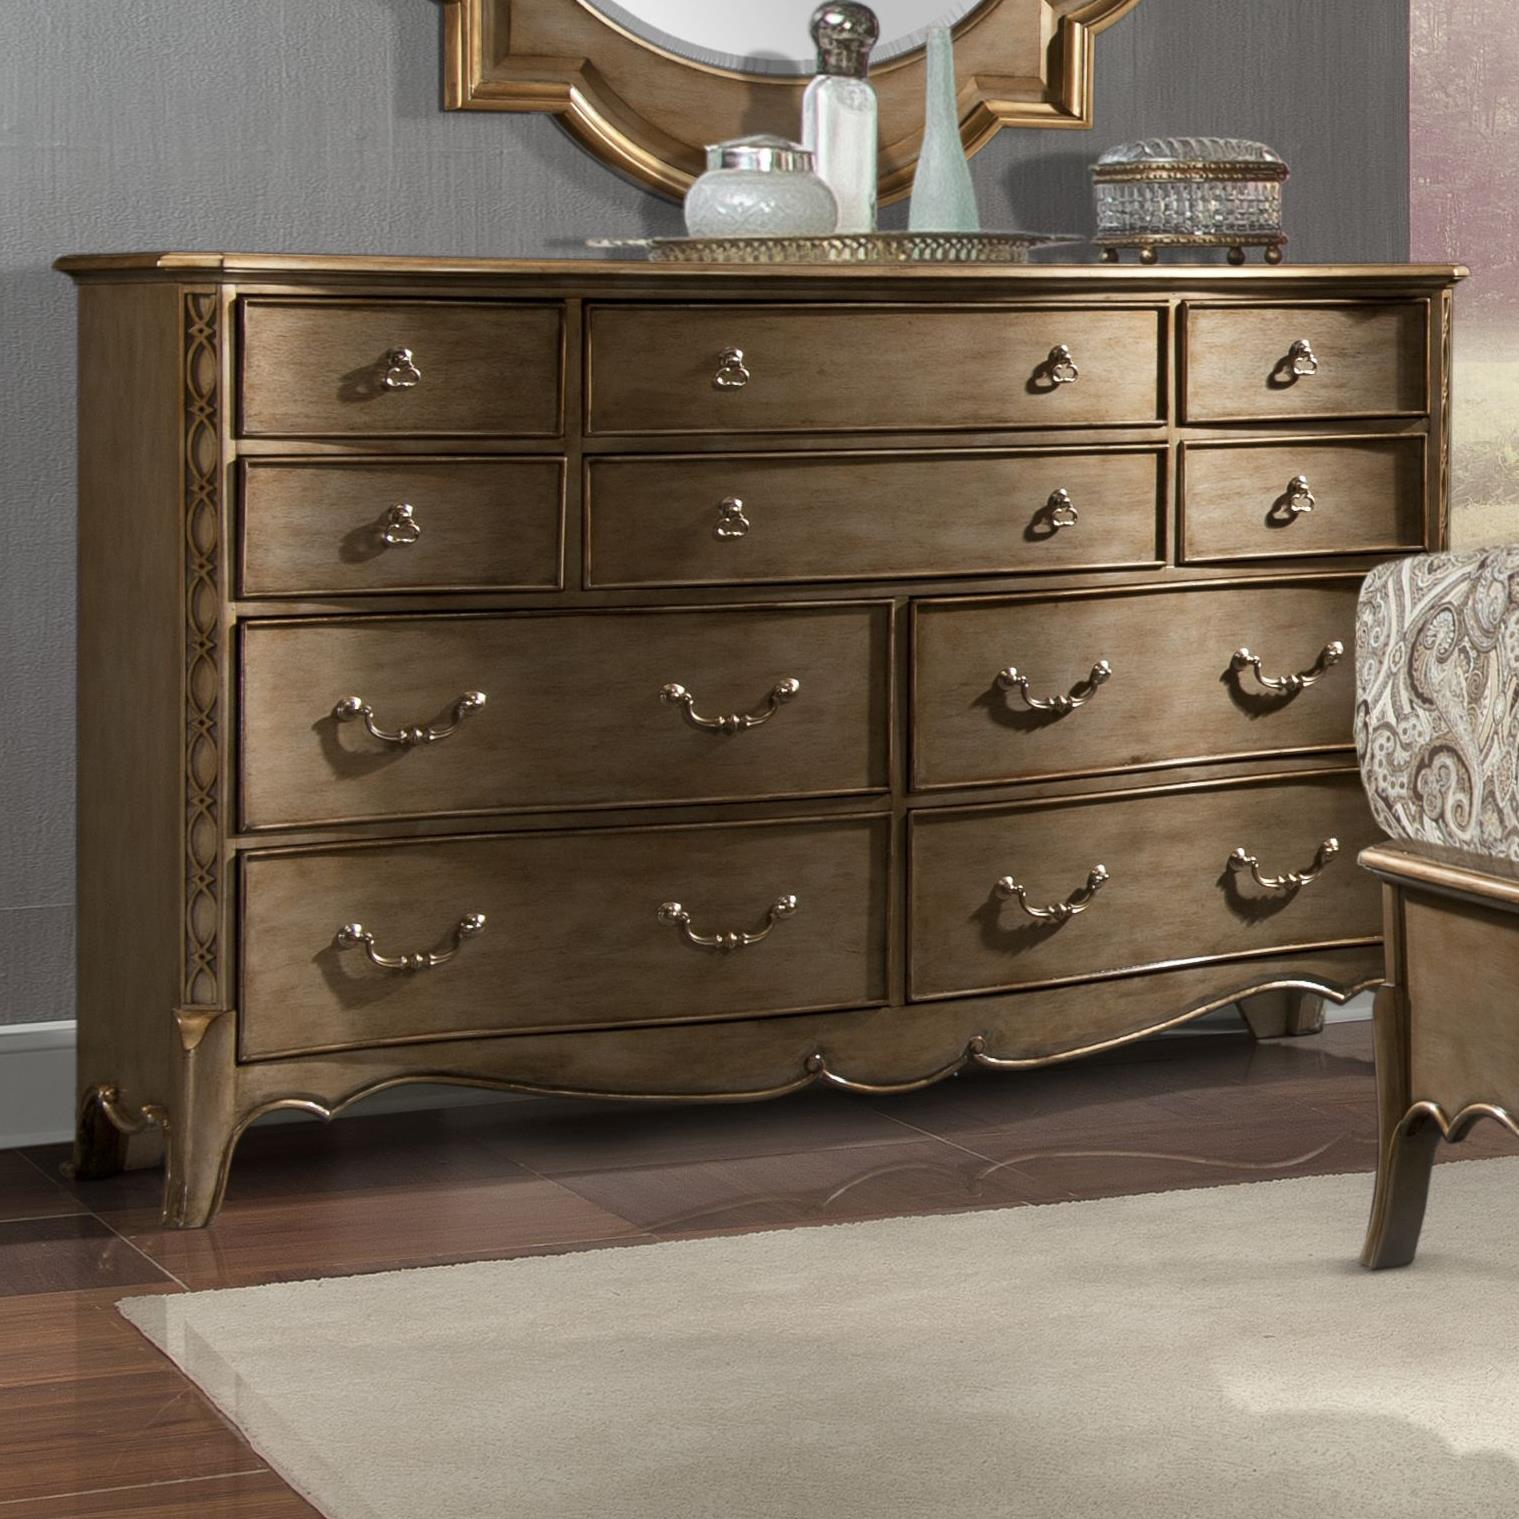 Homelegance Chambord Dresser - Item Number: 1828-5